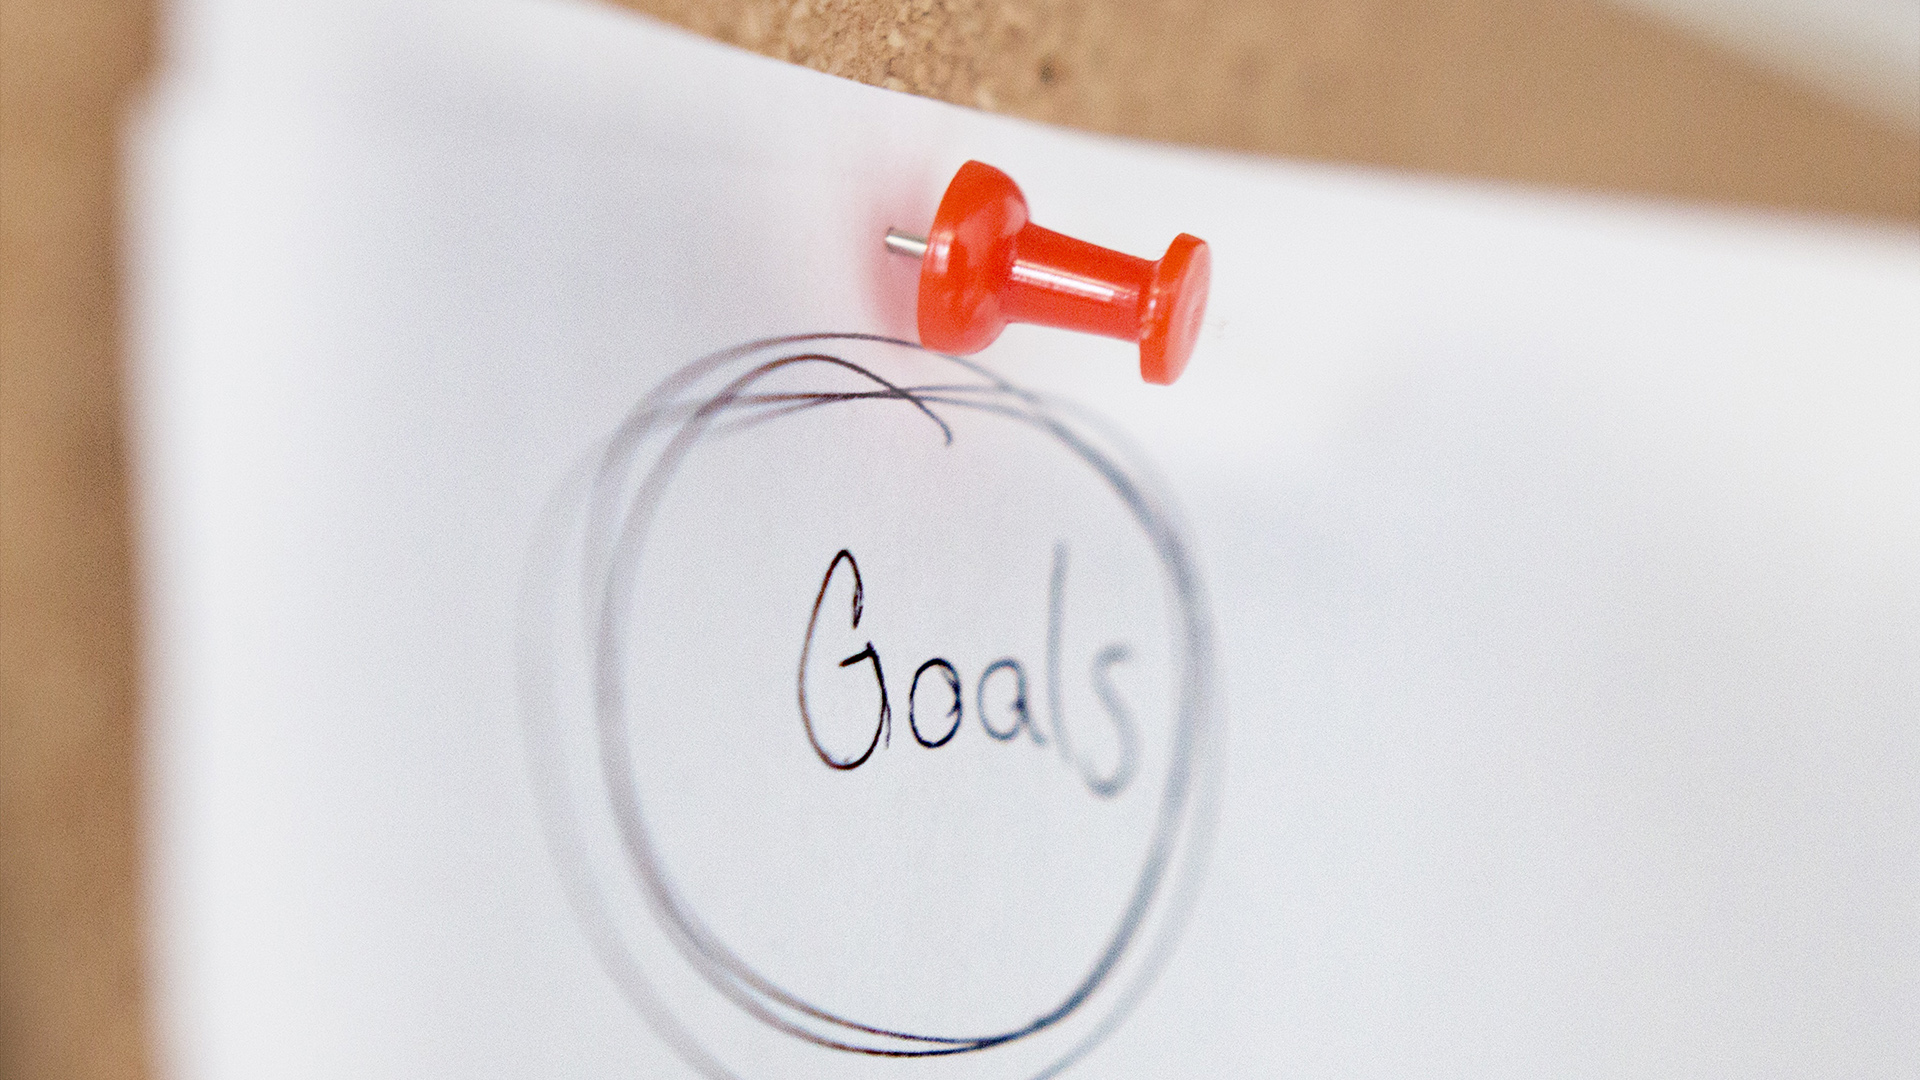 1080_Goals_Note_Shot